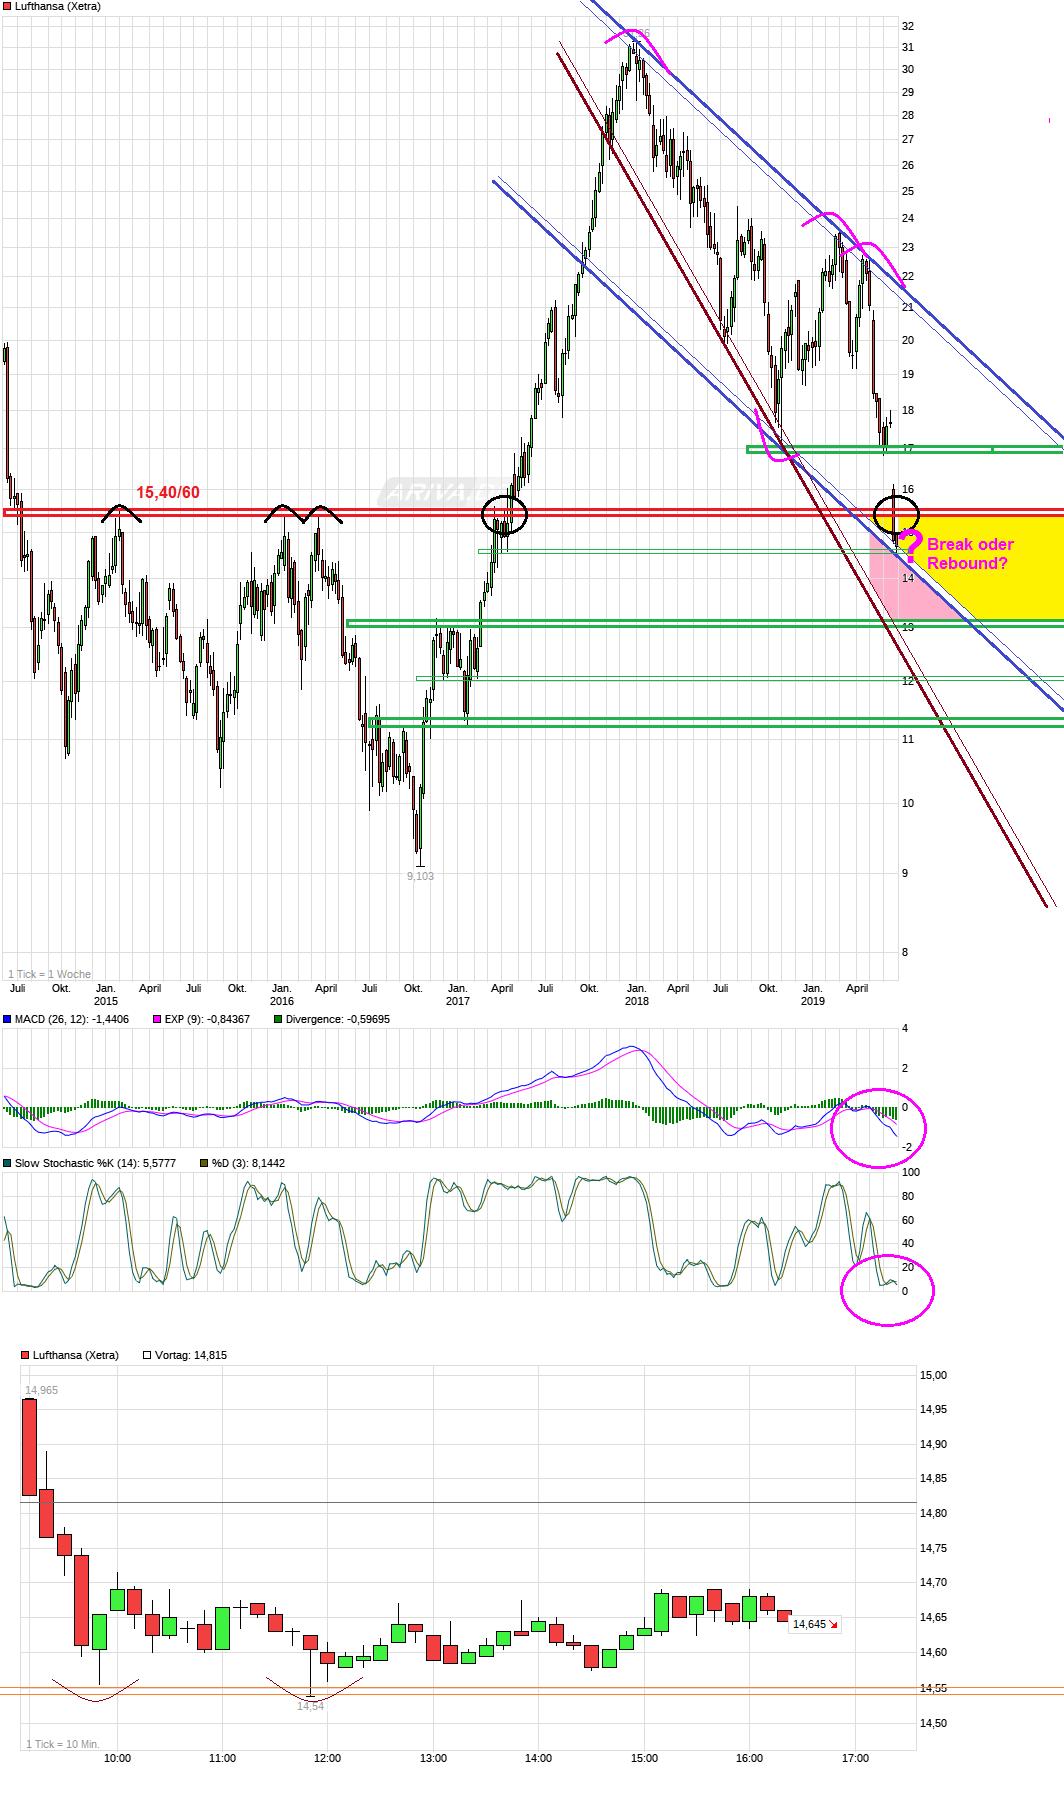 chart_5years_lufthansa.png